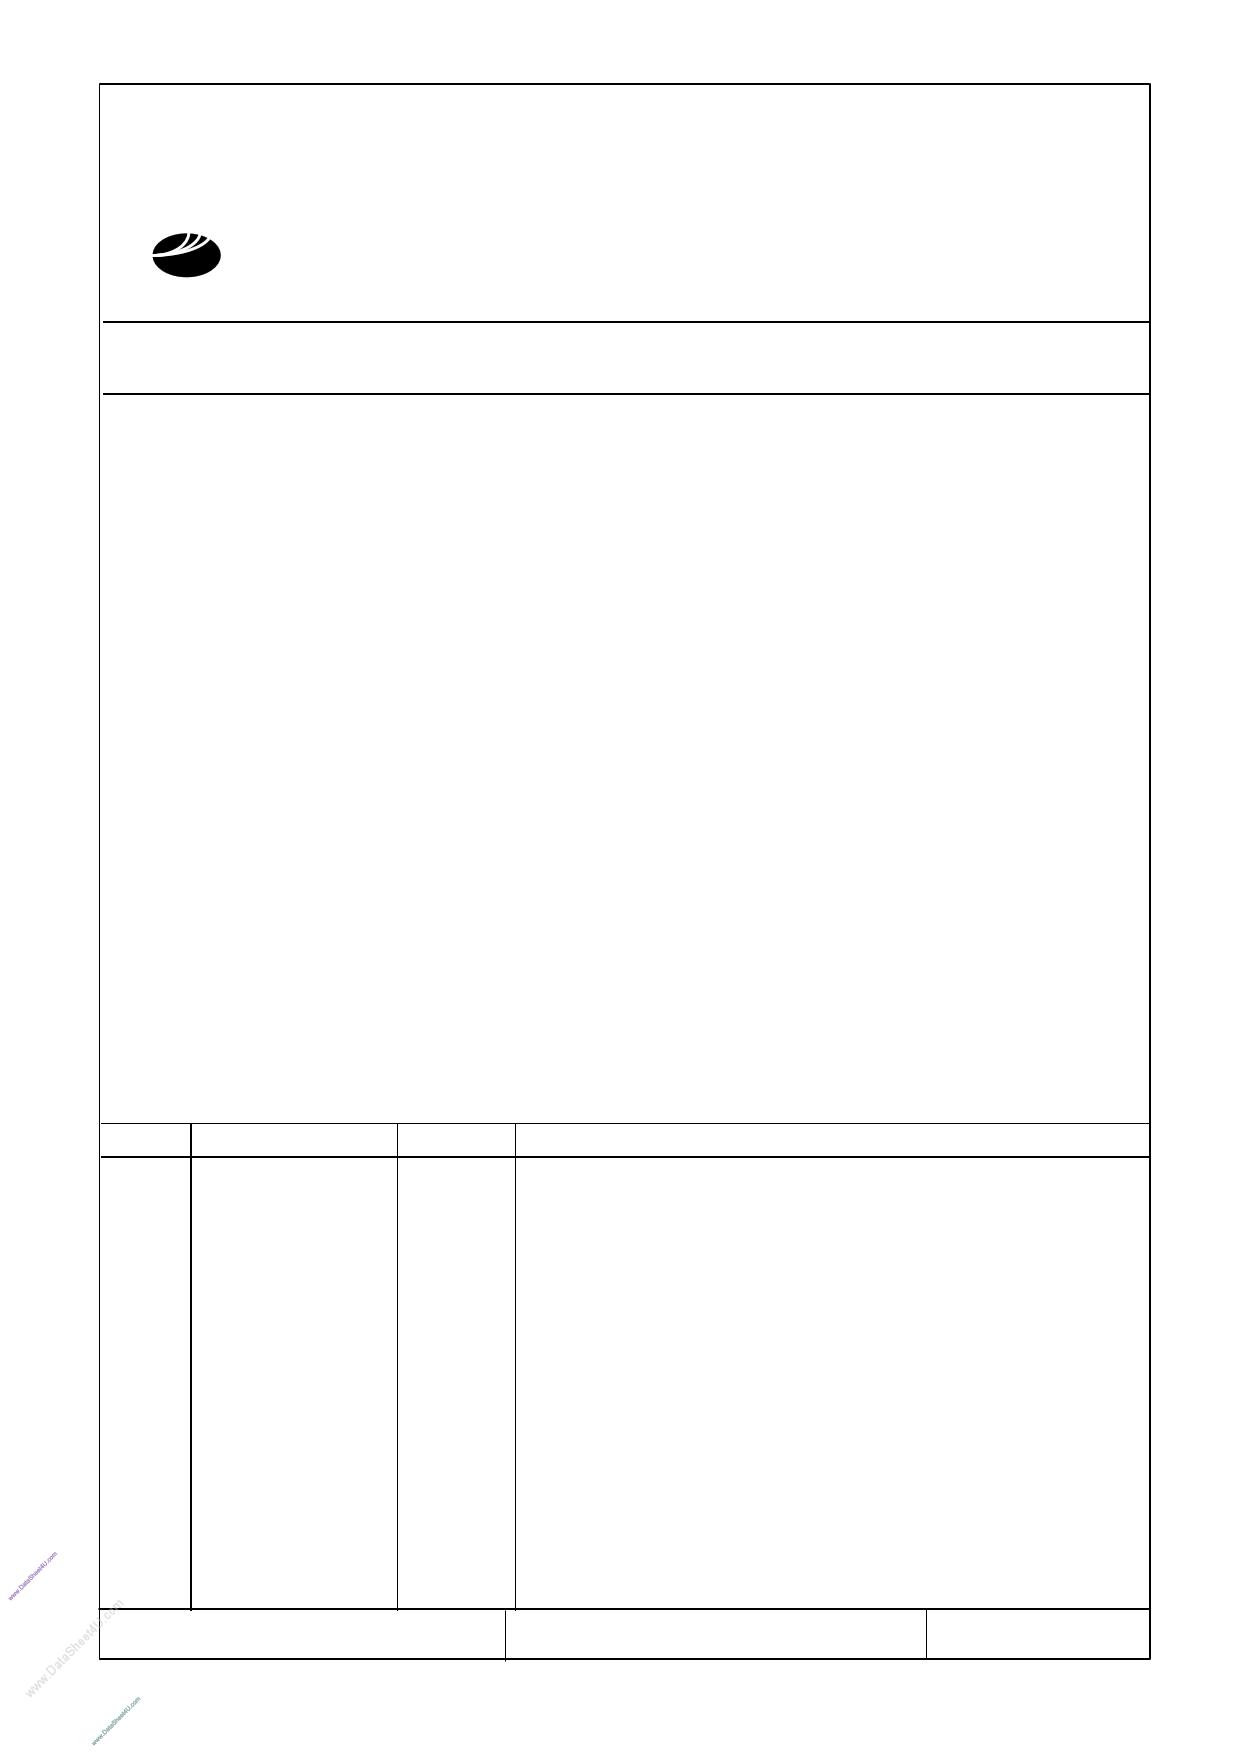 T-51514D084J-FW_A_AA دیتاشیت PDF